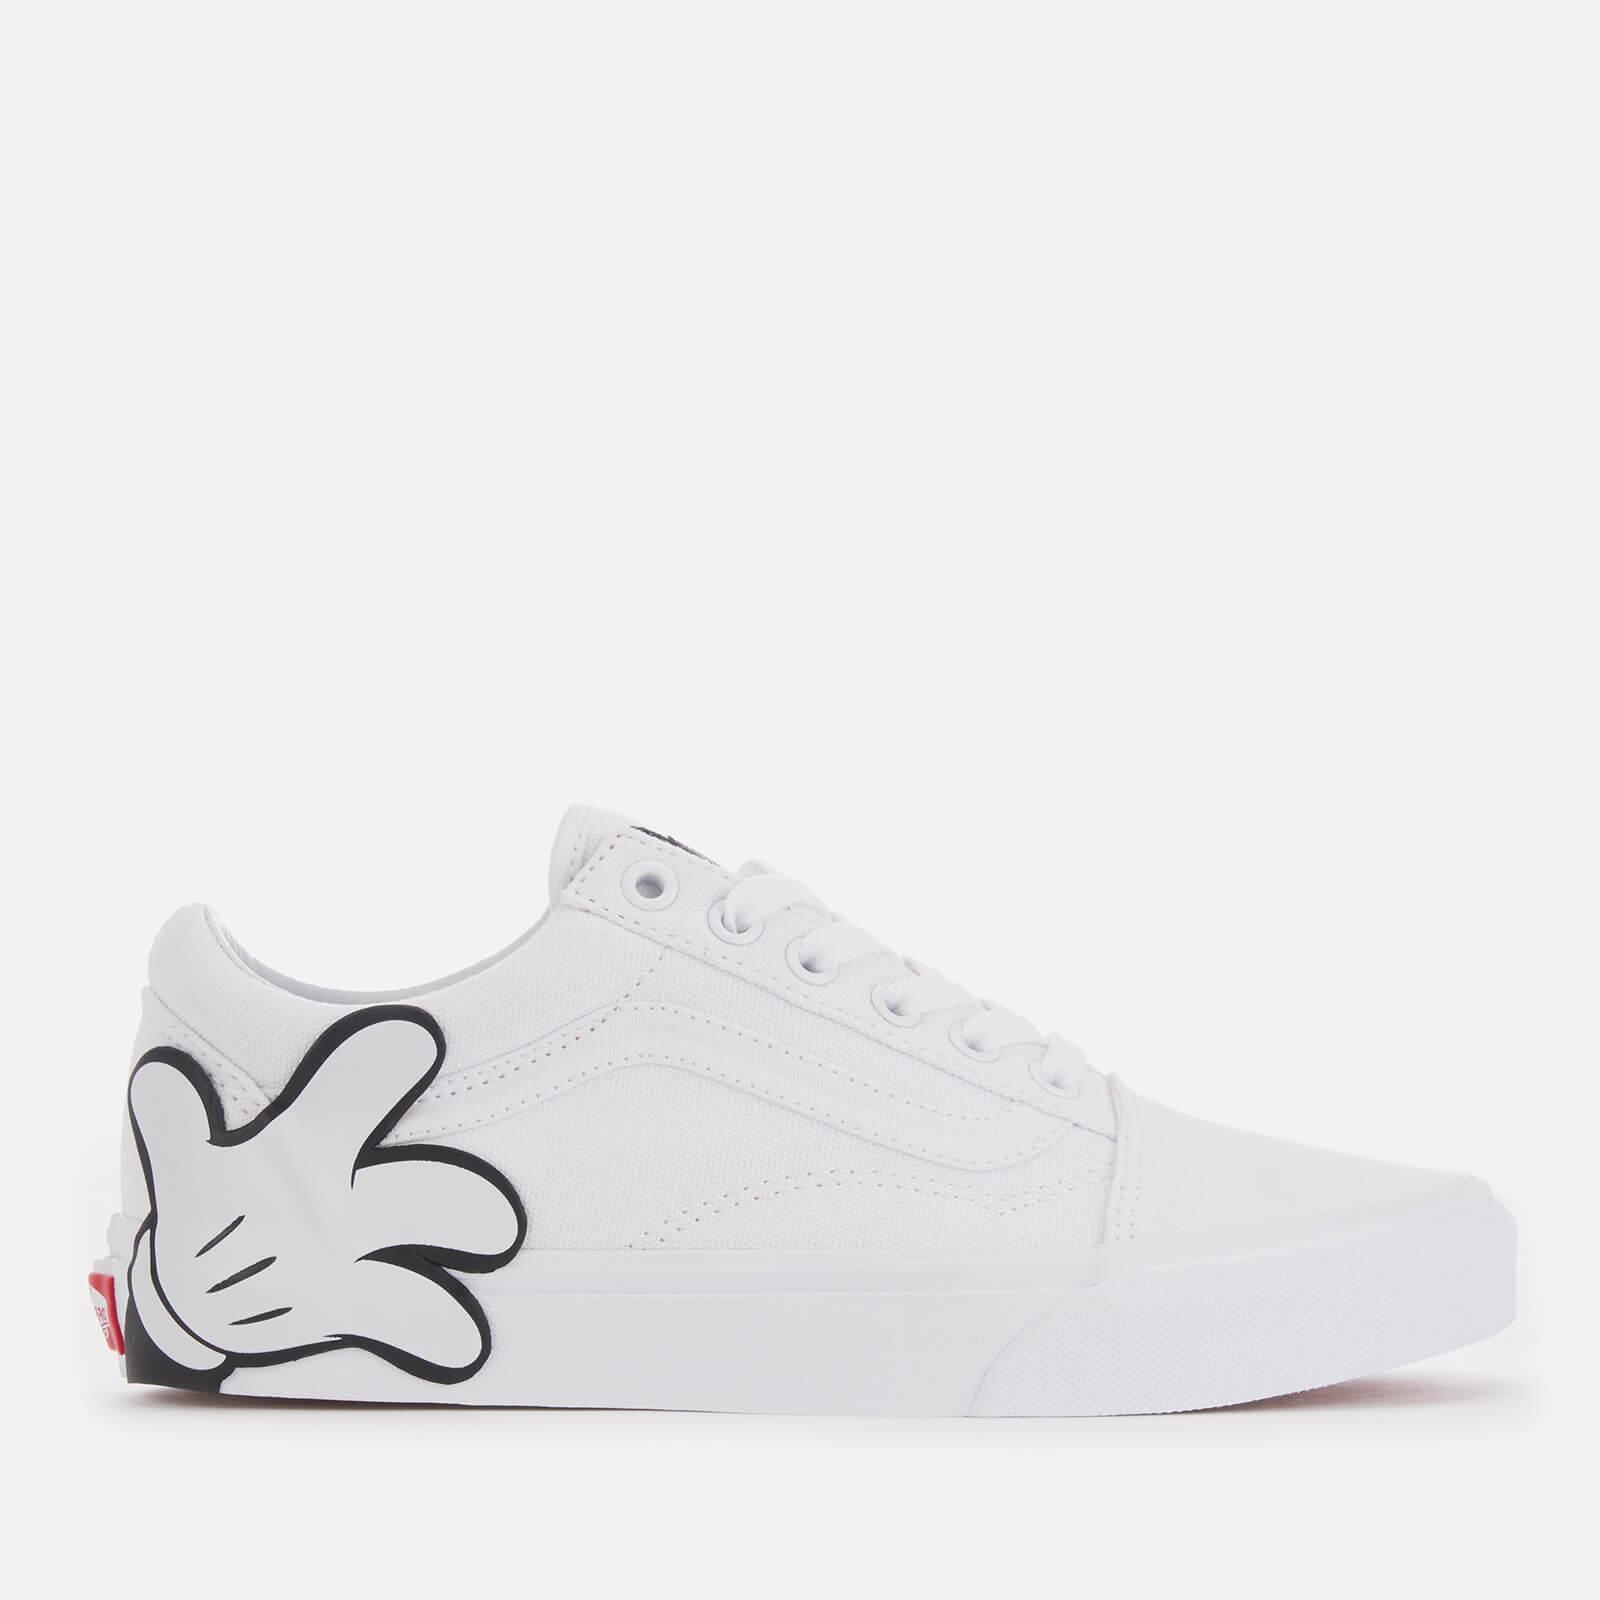 d10d154397 Vans Women s Disney Mickey Old Skool Trainers - True White Womens Footwear